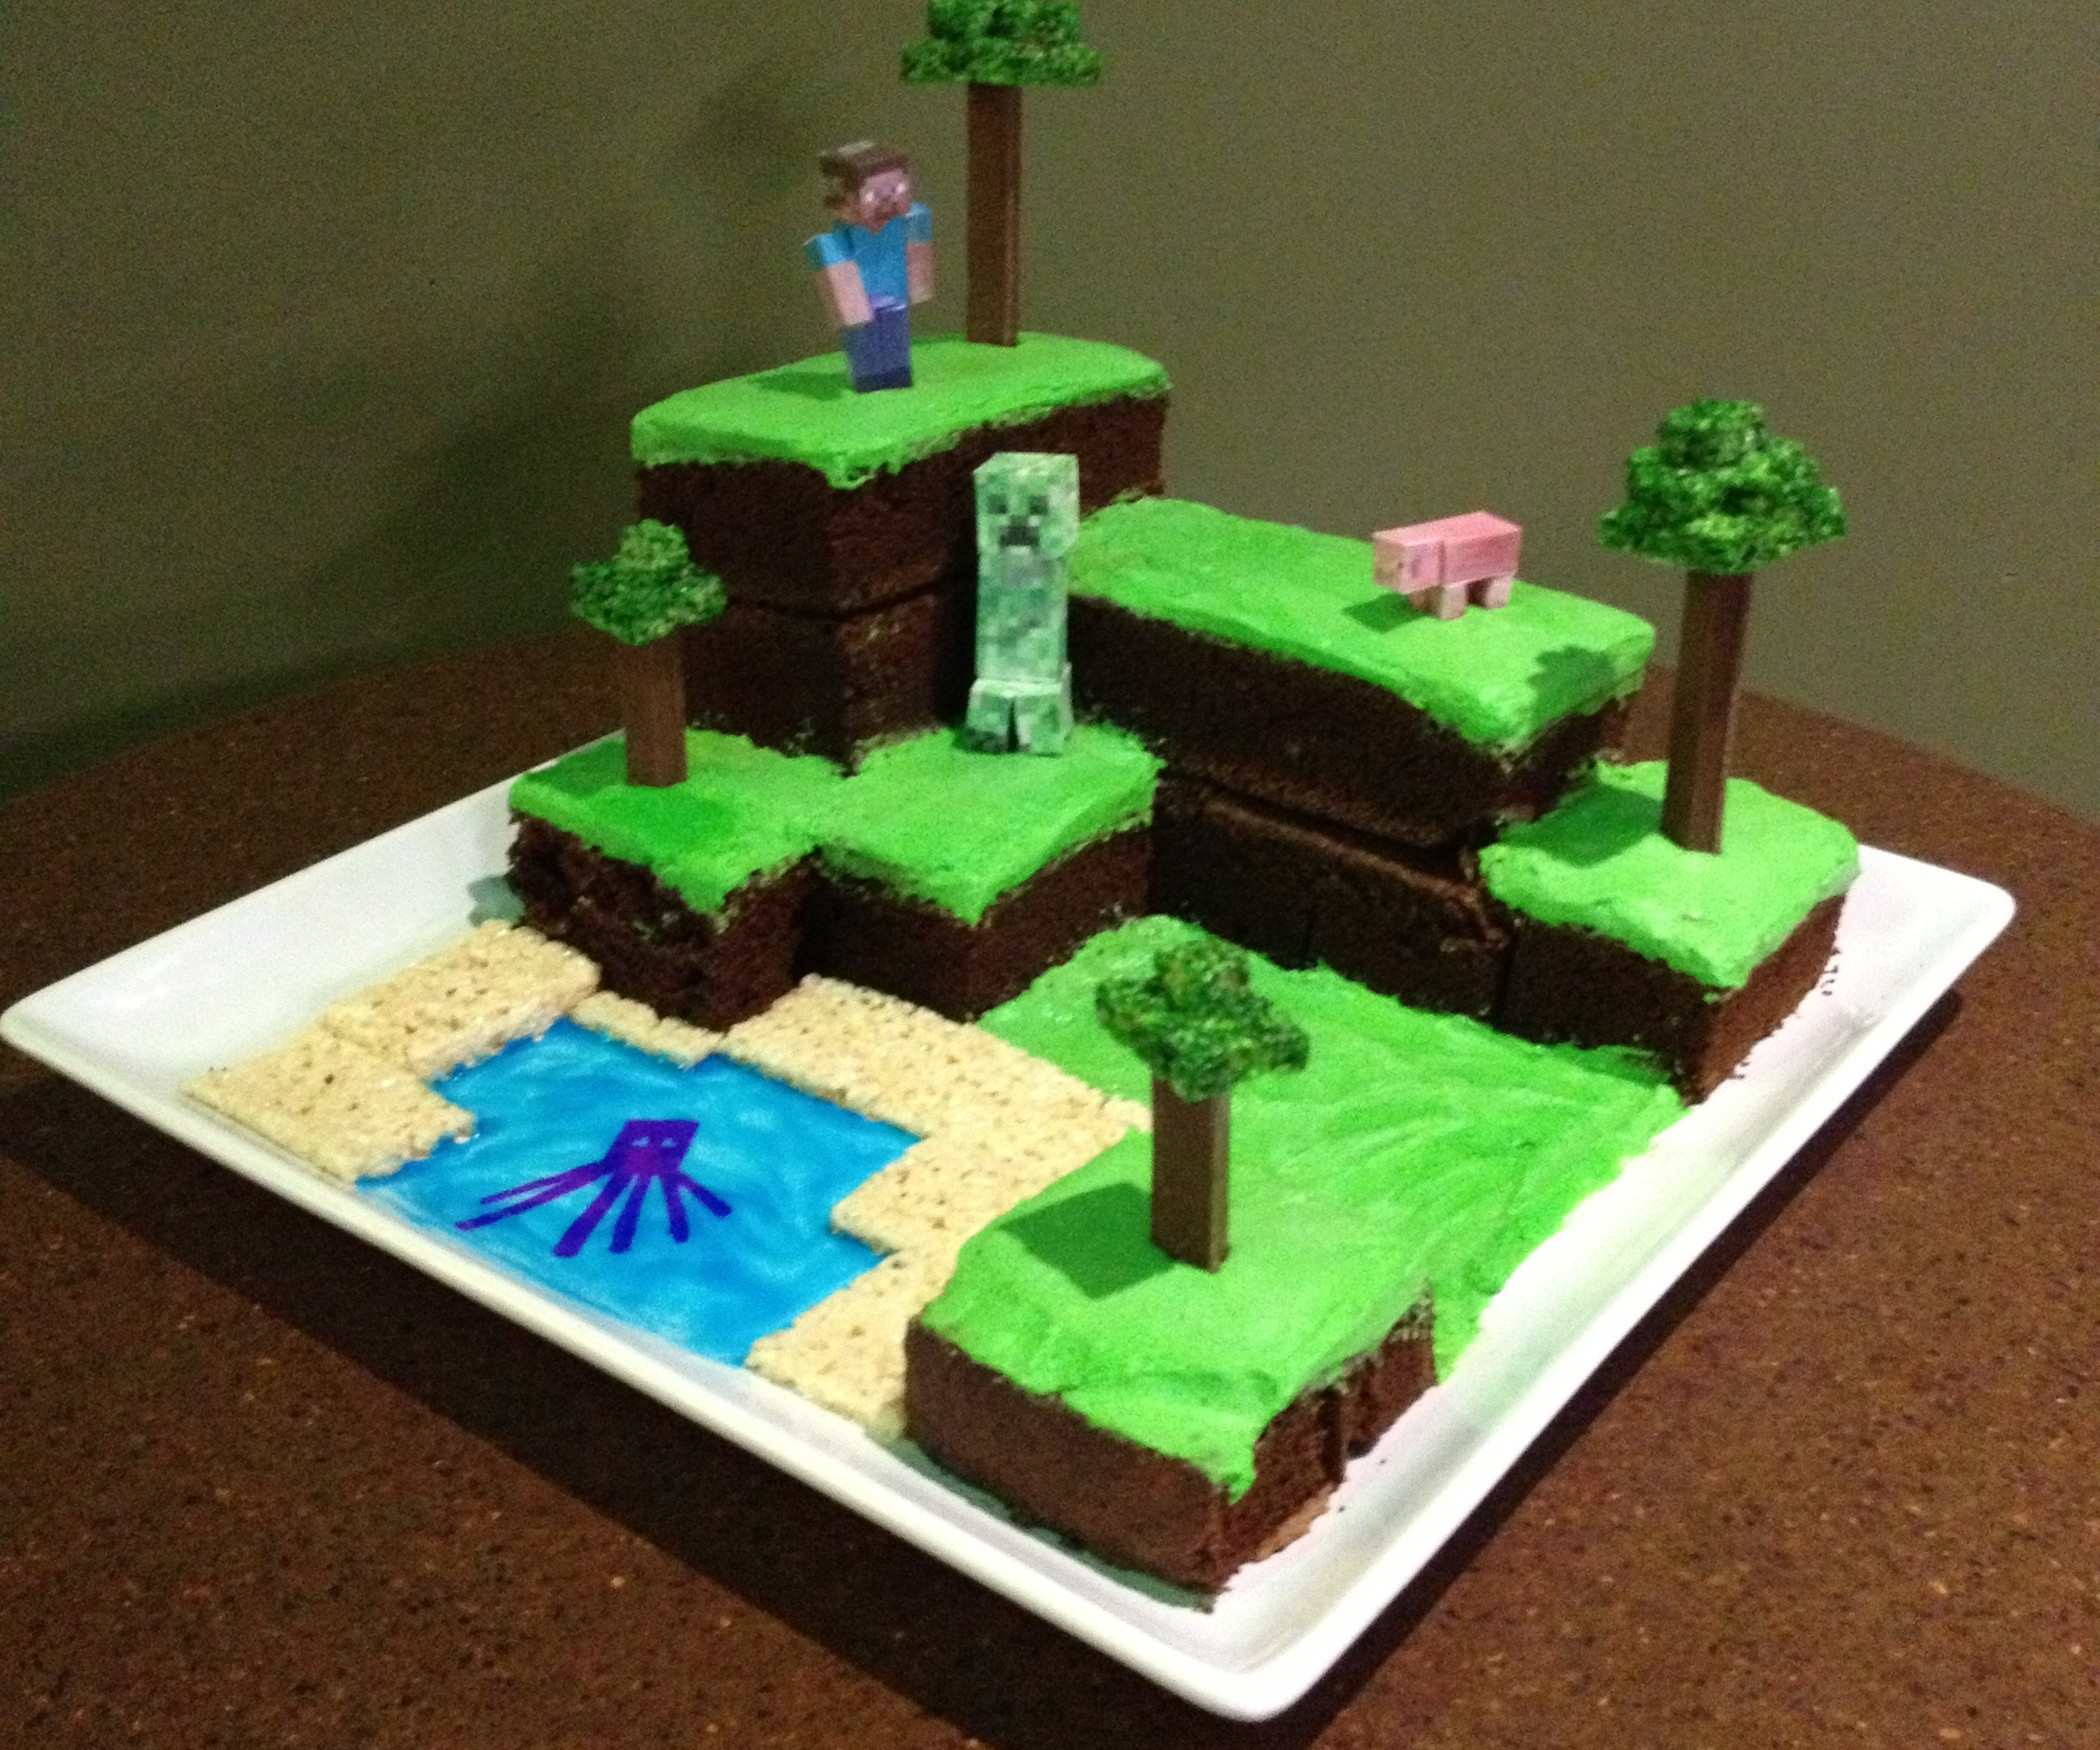 How To Make A Minecraft Birthday Cake  Minecraft World Cake with